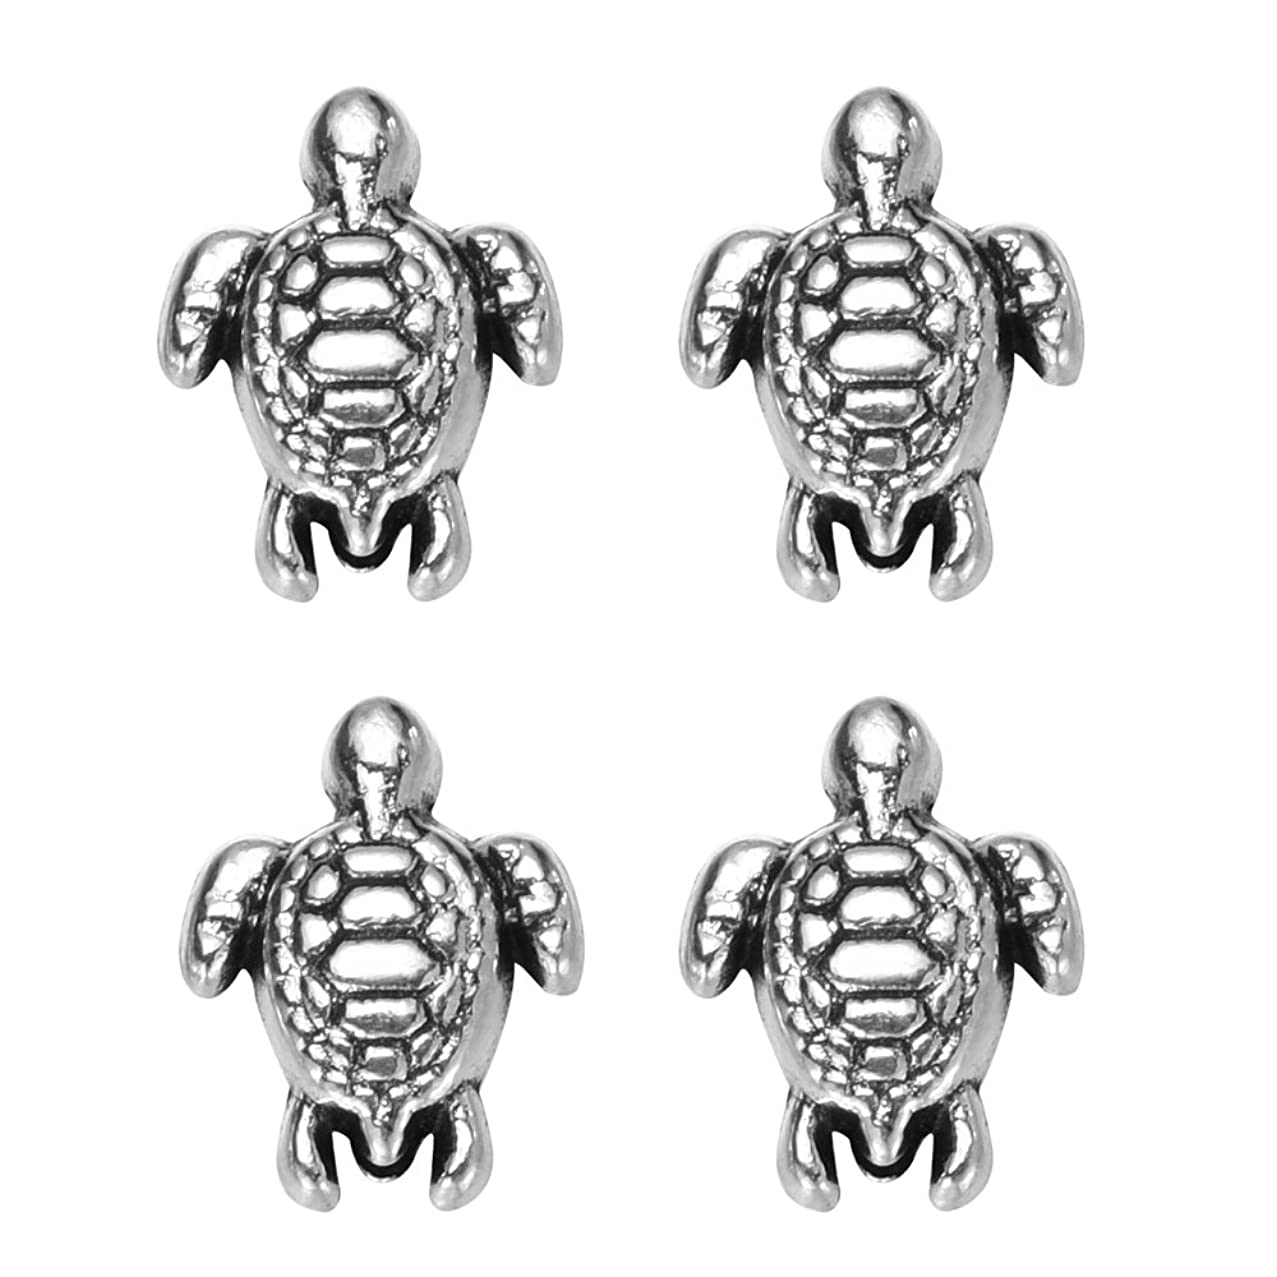 zhangdongDIY 160 pcs Antique Silver Lovely Turtle Pendant Bead Fit Original Charms Bracelet Jewelry Making 9x7mm